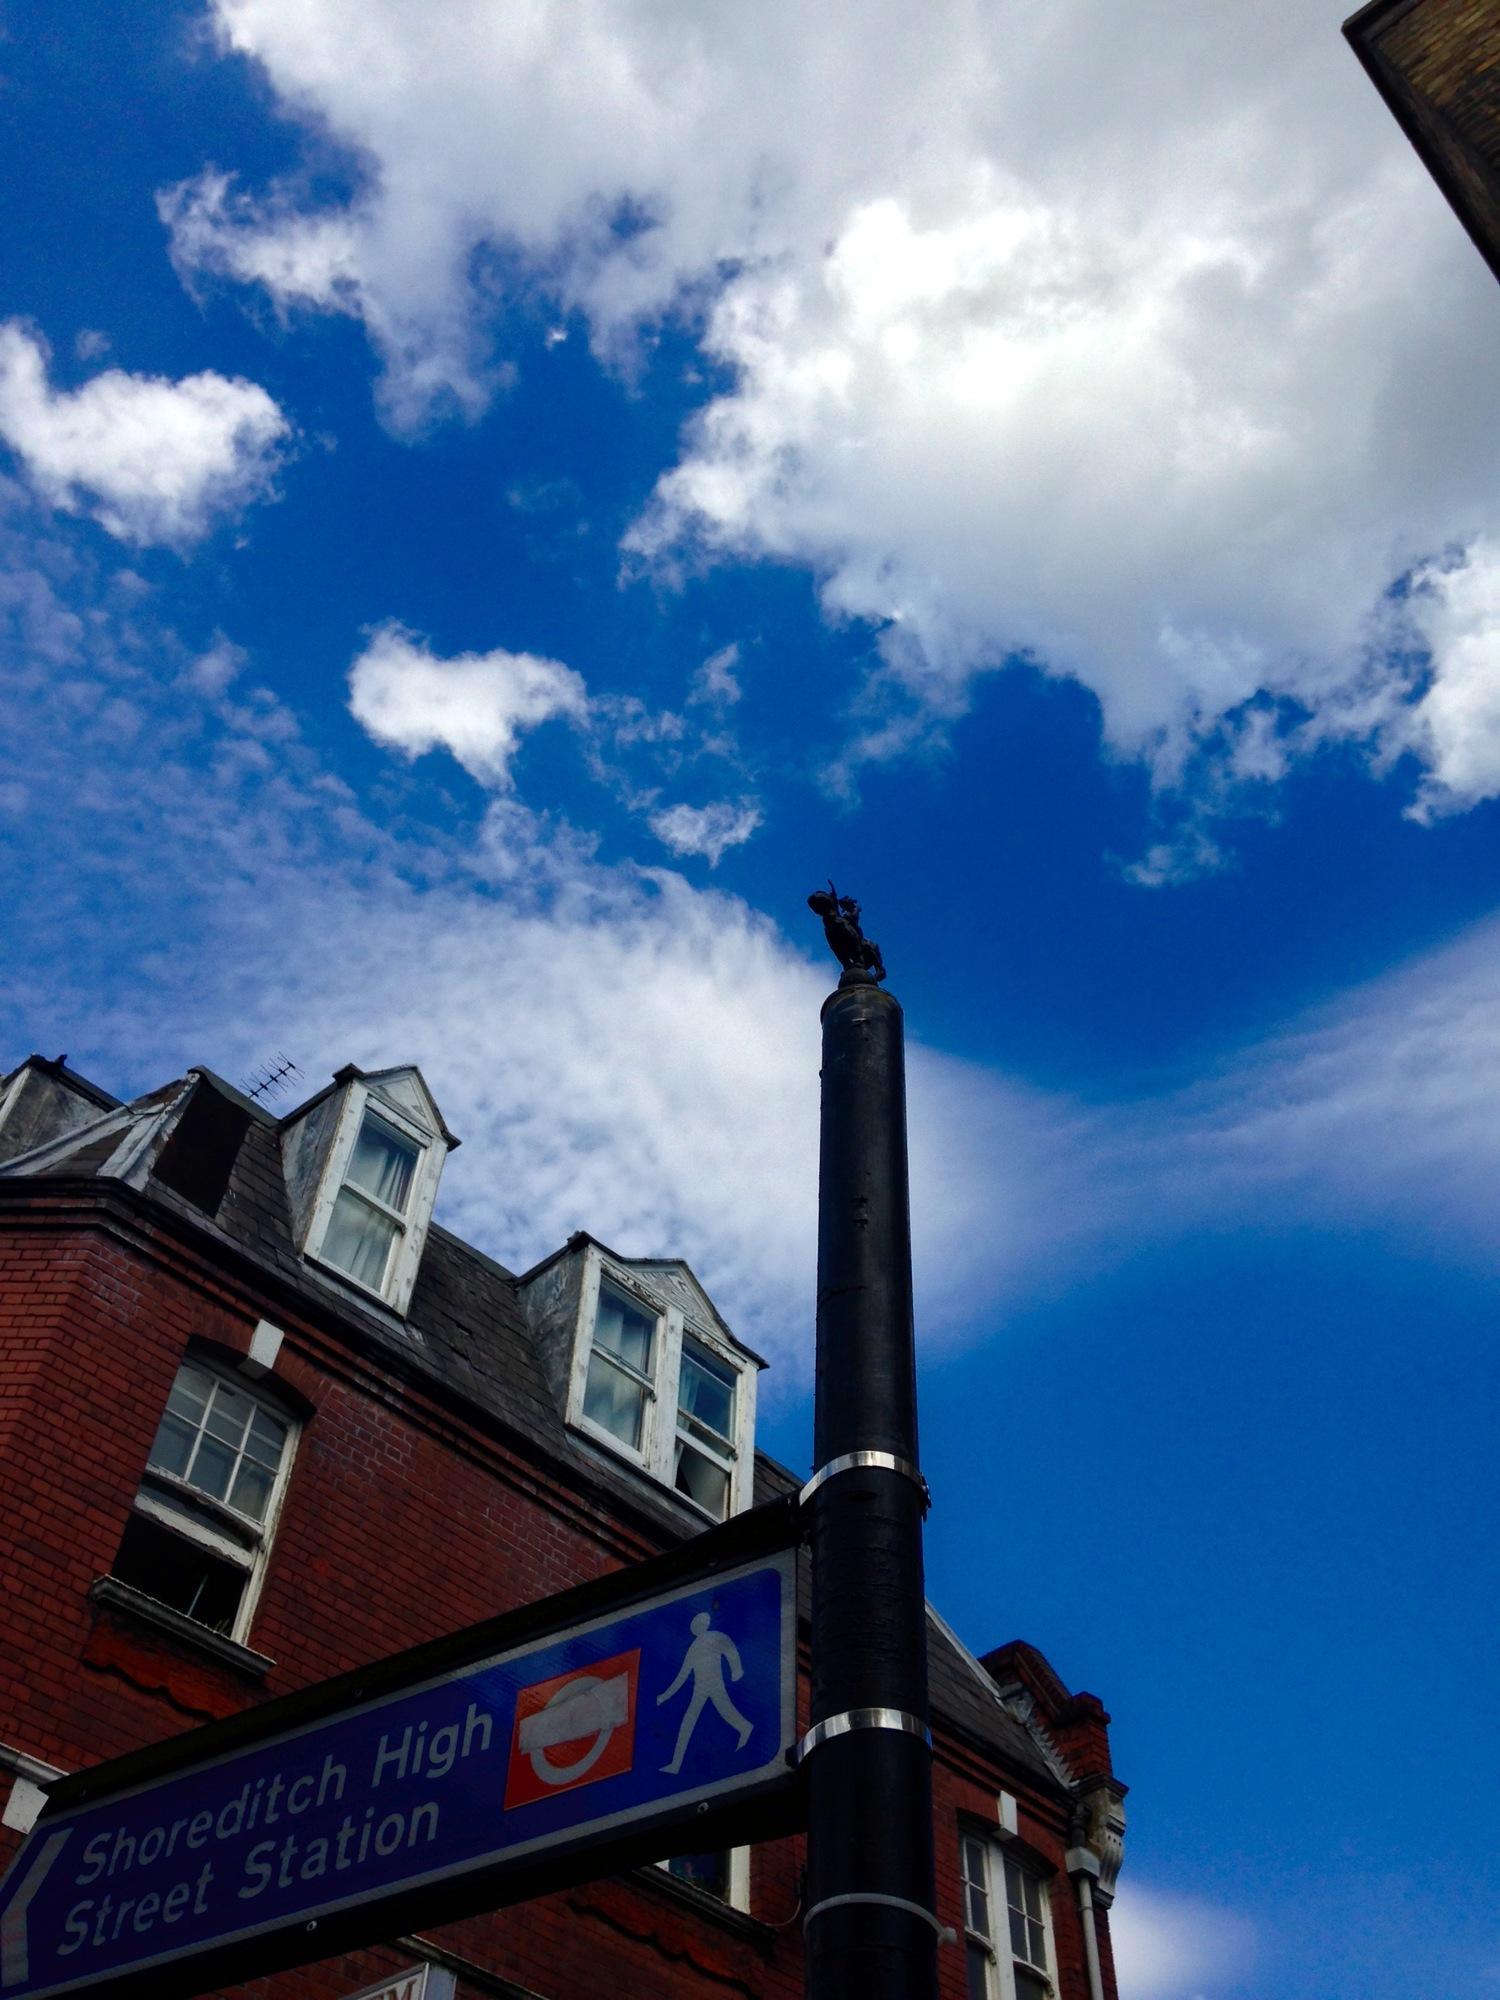 Photo 2: piece by Jonesy on Shoreditch High Street Station sign post